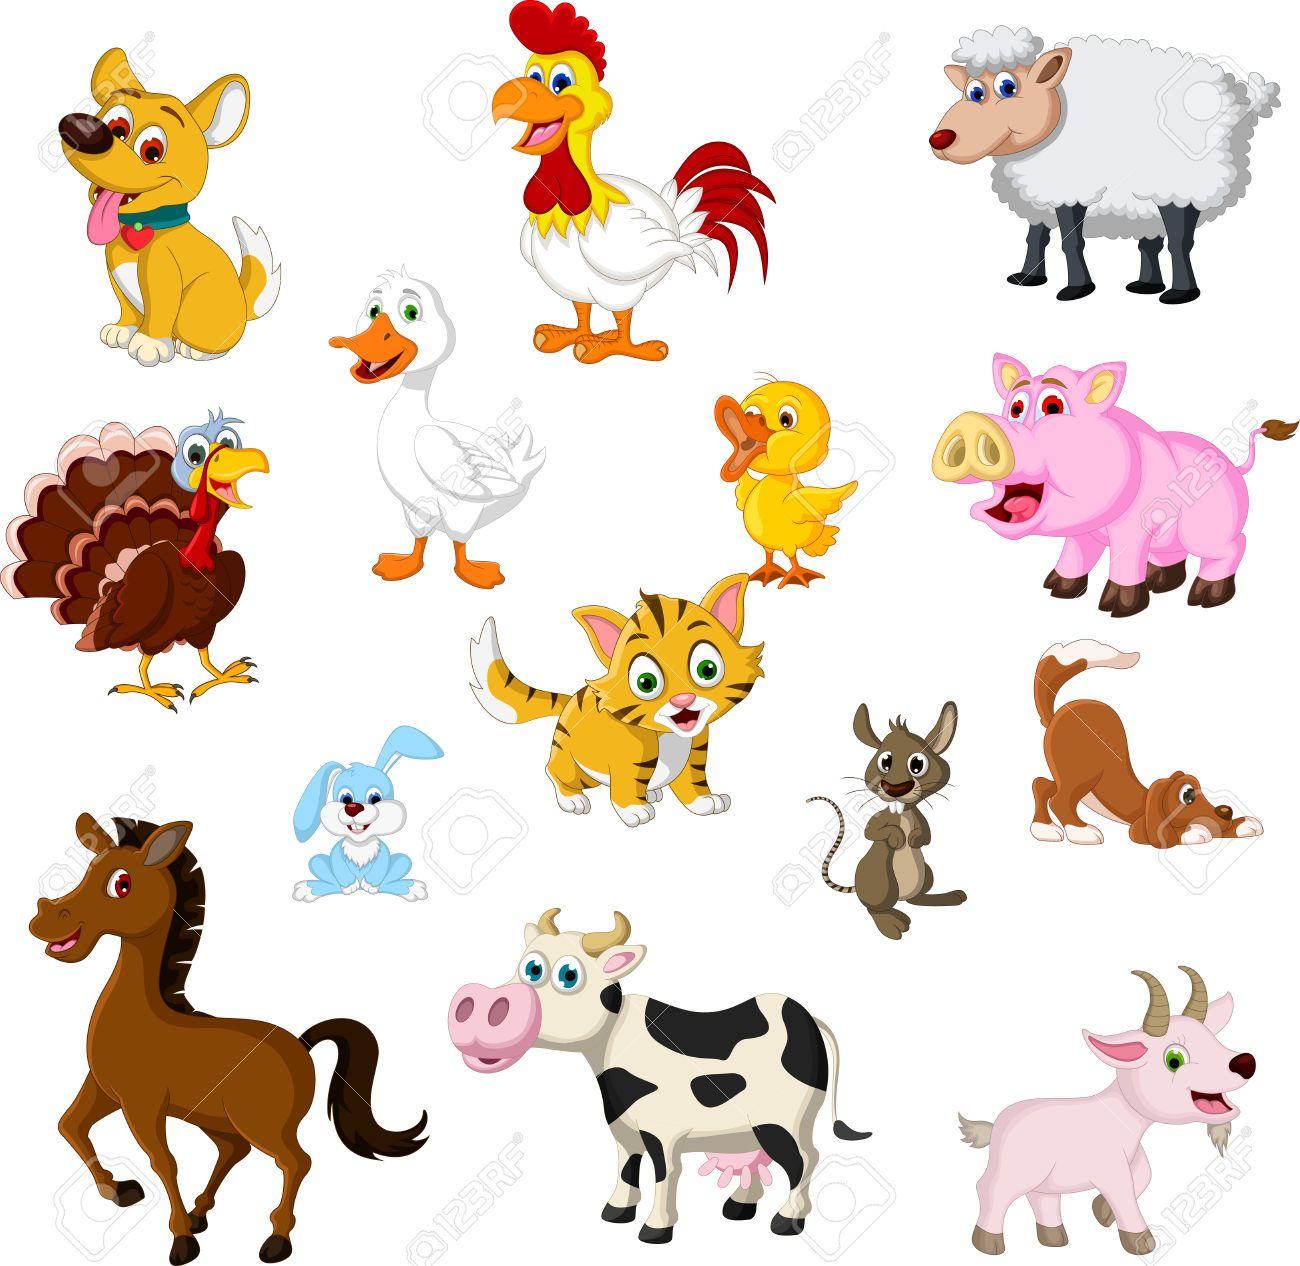 Farm Animal Cartoon Collection Cartoon Animals Animal Clipart Farm Animals Preschool